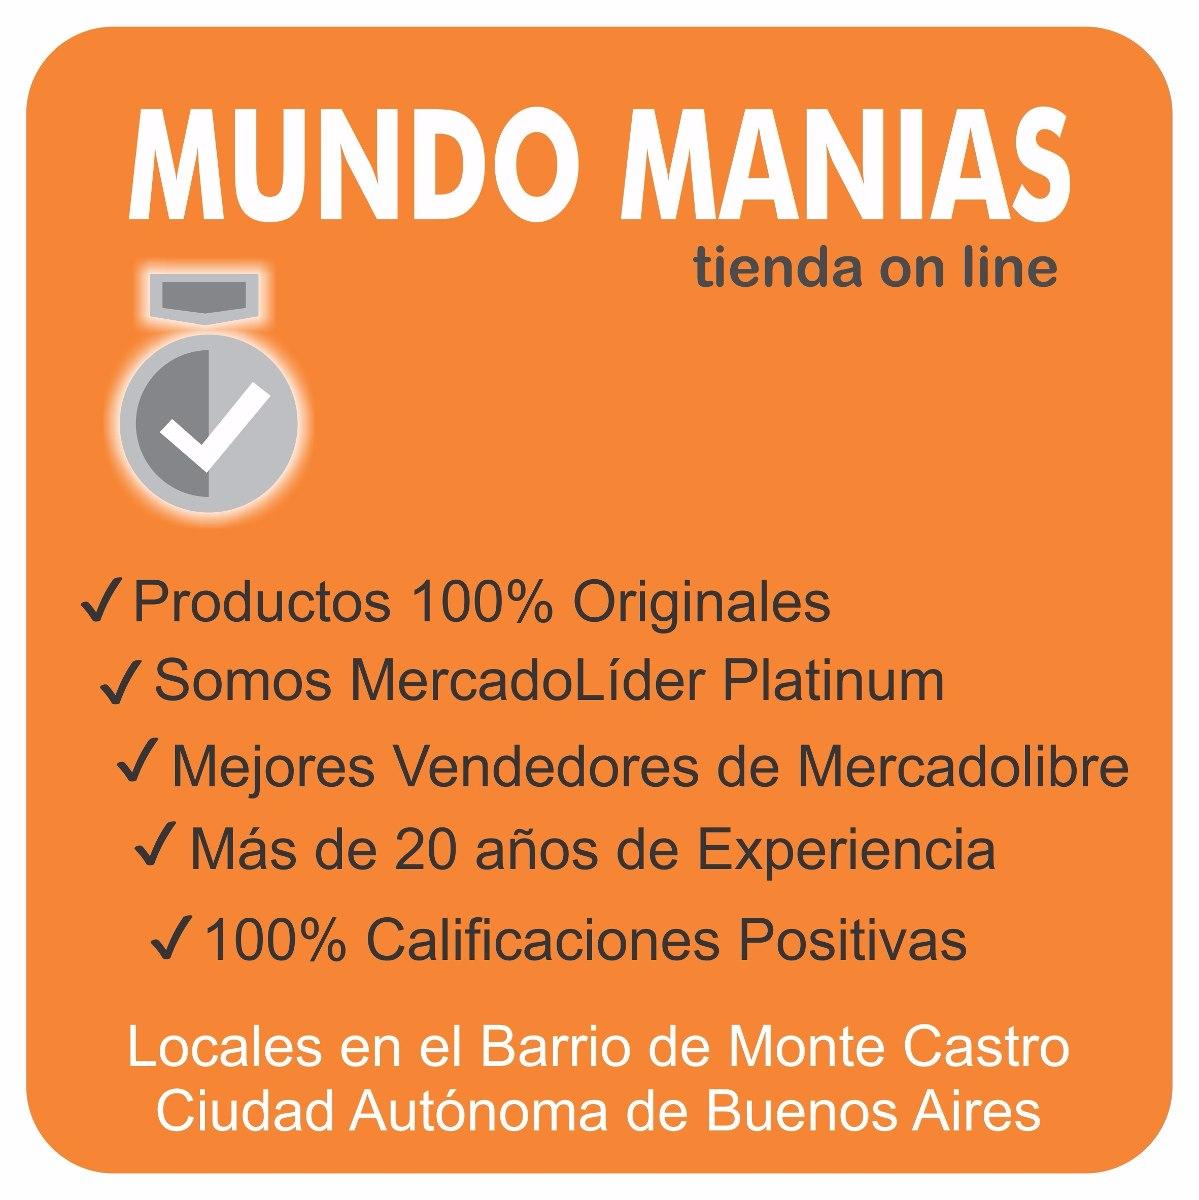 Afeitadora Electrica Philips Hq6908 En Seco - Mundo Manias -   999 ... 80281e5094f9